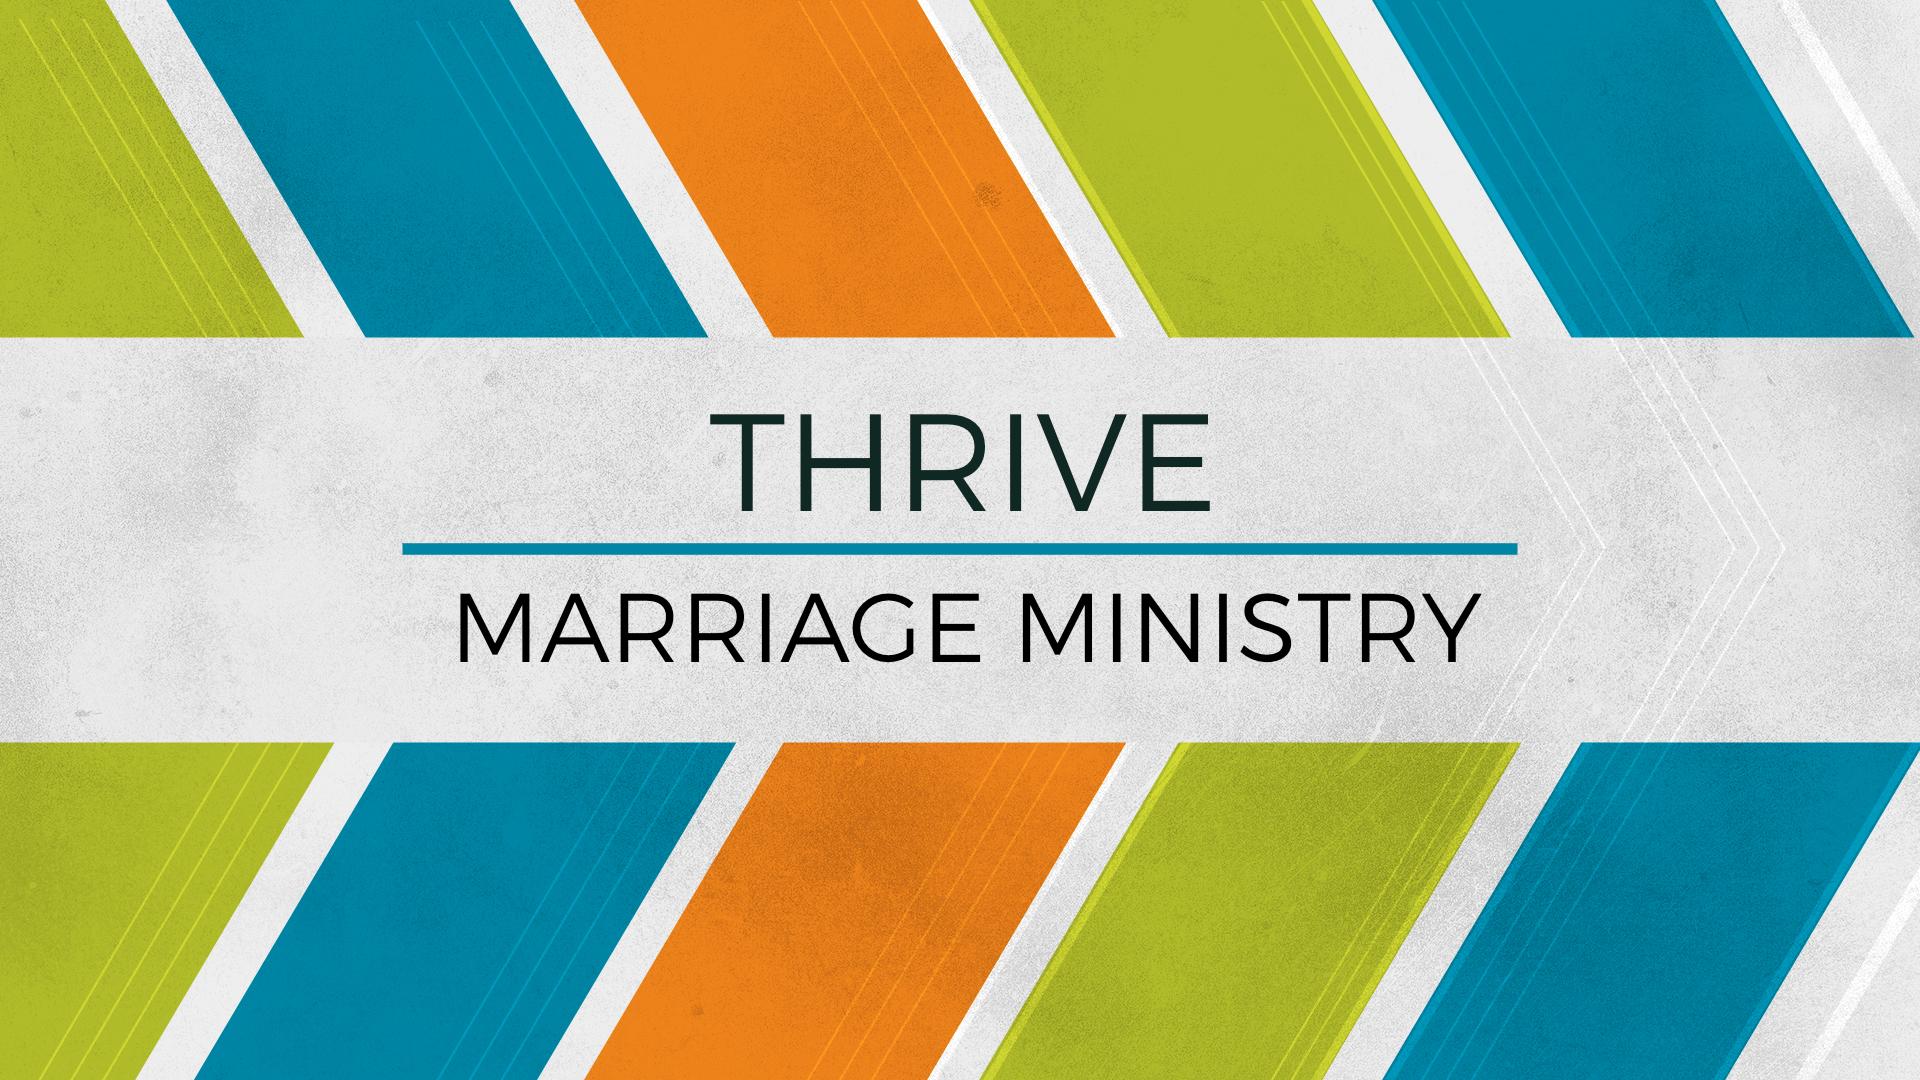 Marriage ministry logo.jpg